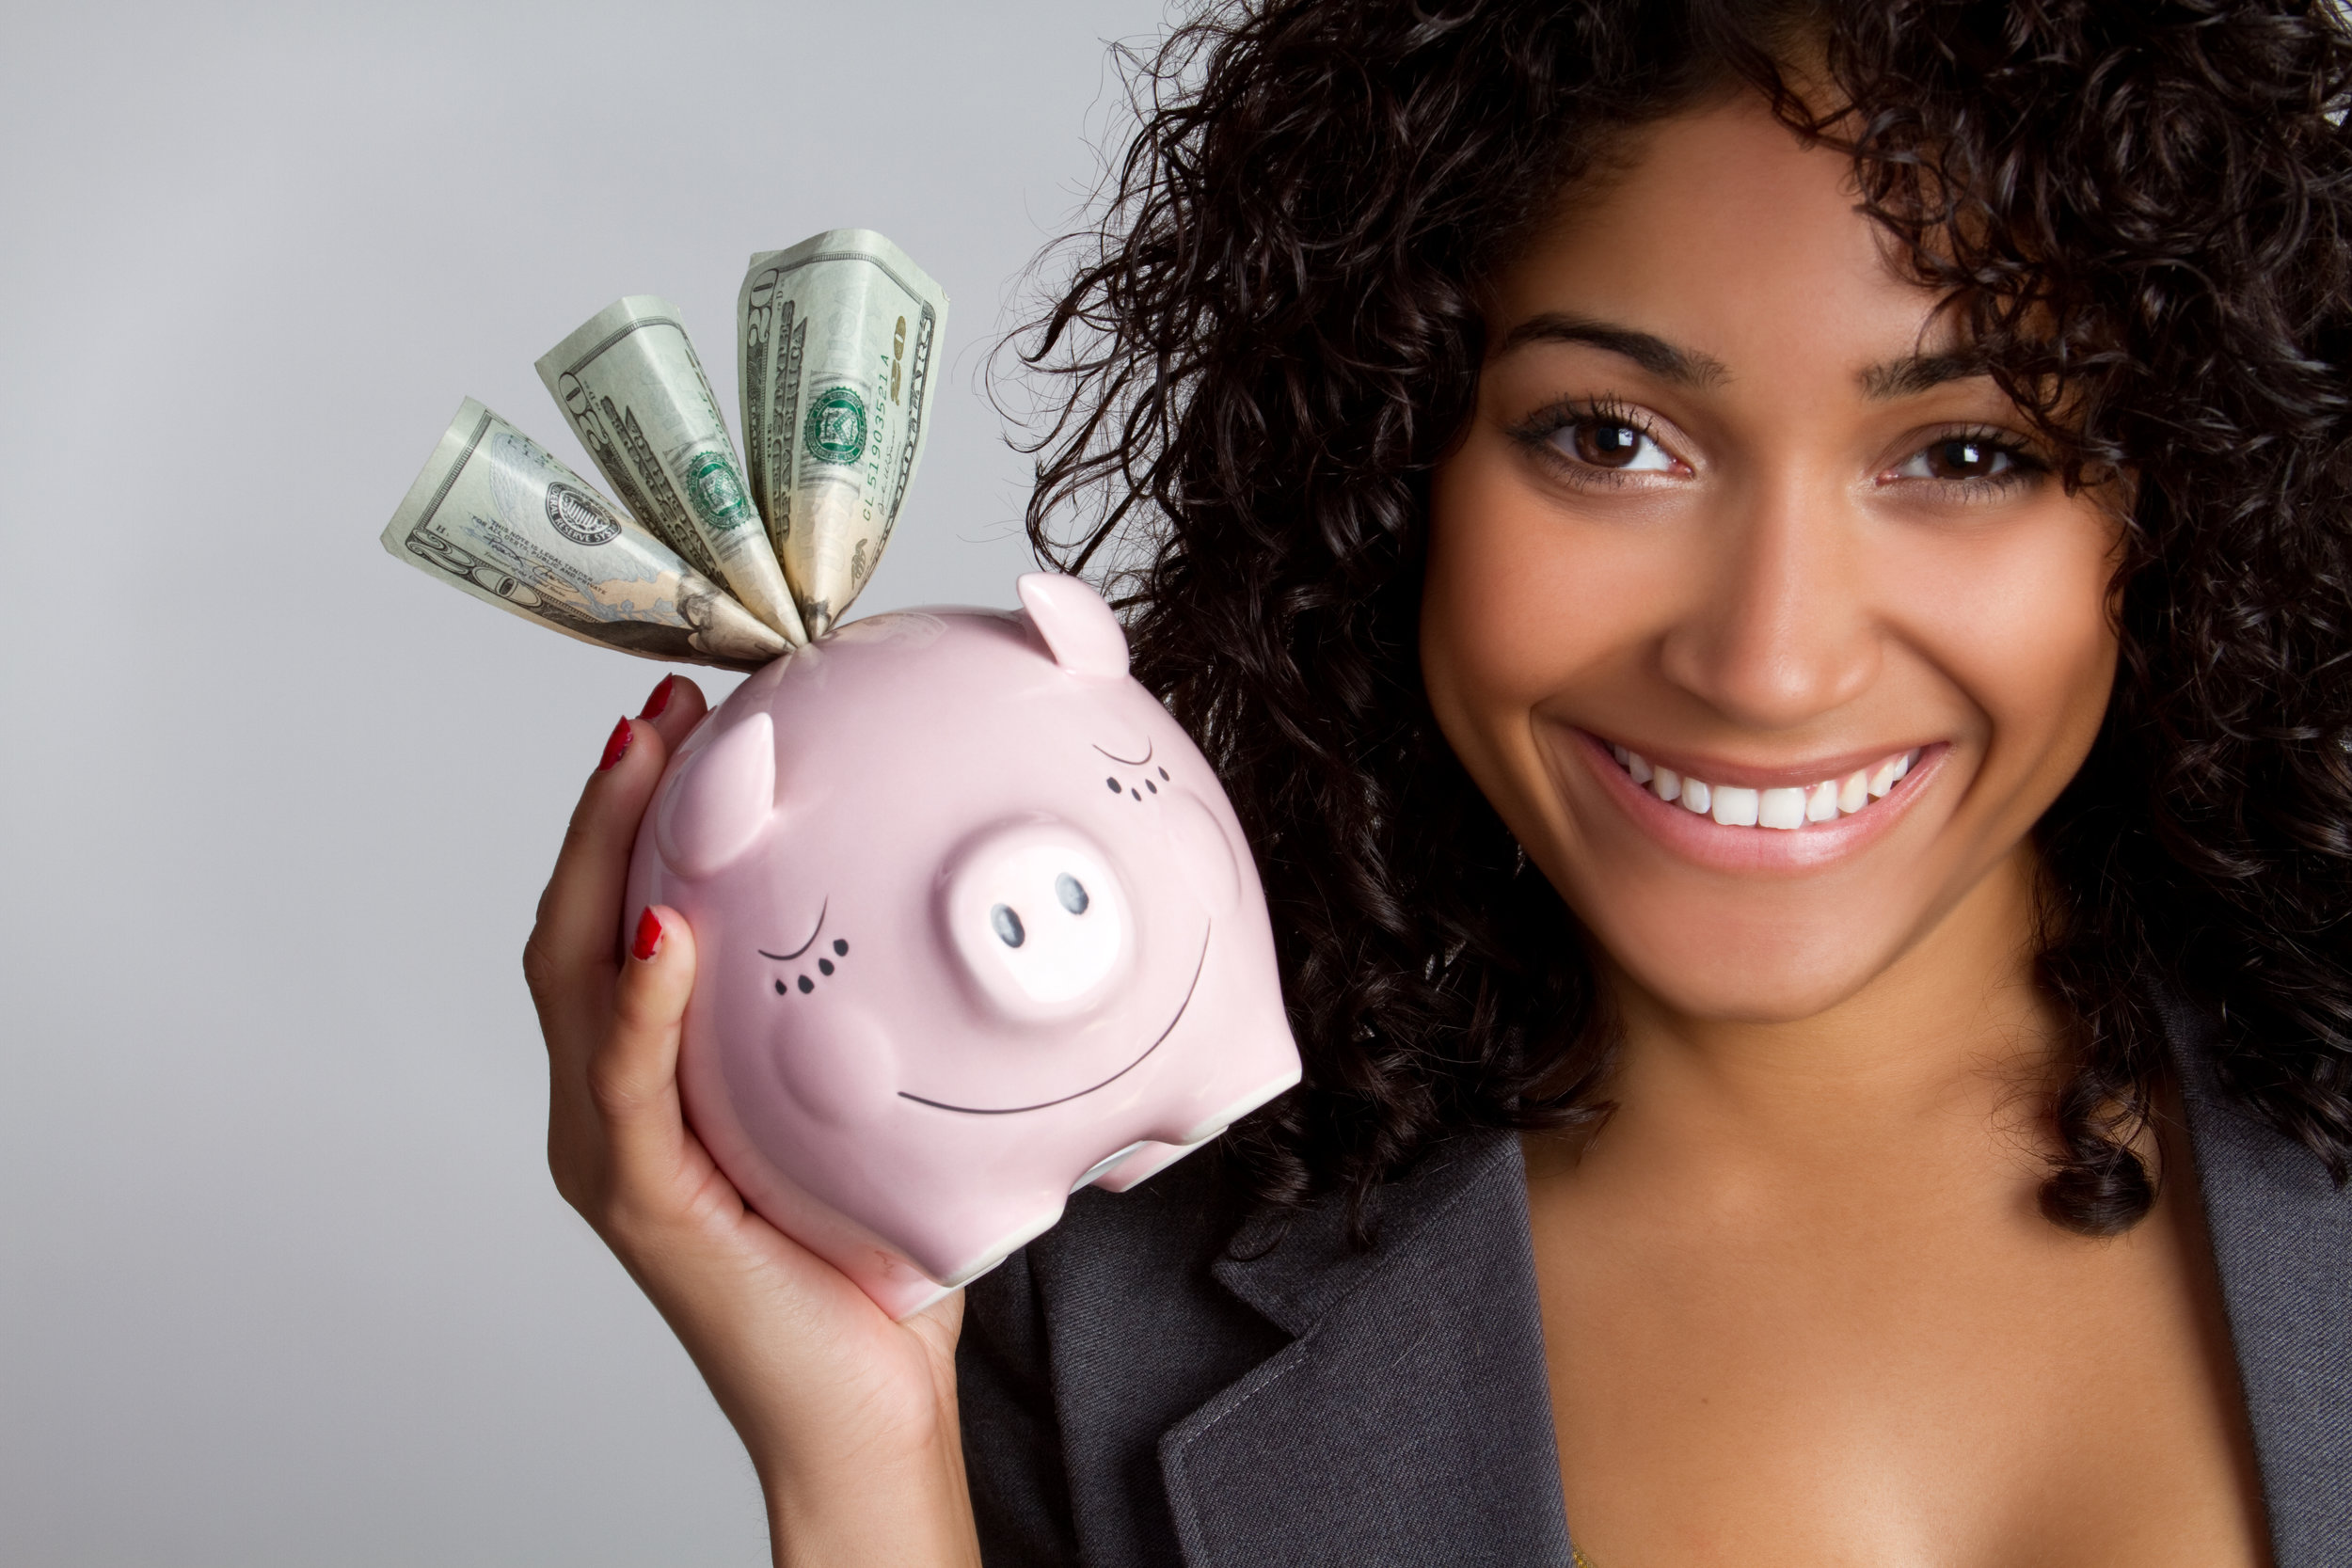 bigstock-African-american-woman-holding-12043496.jpg